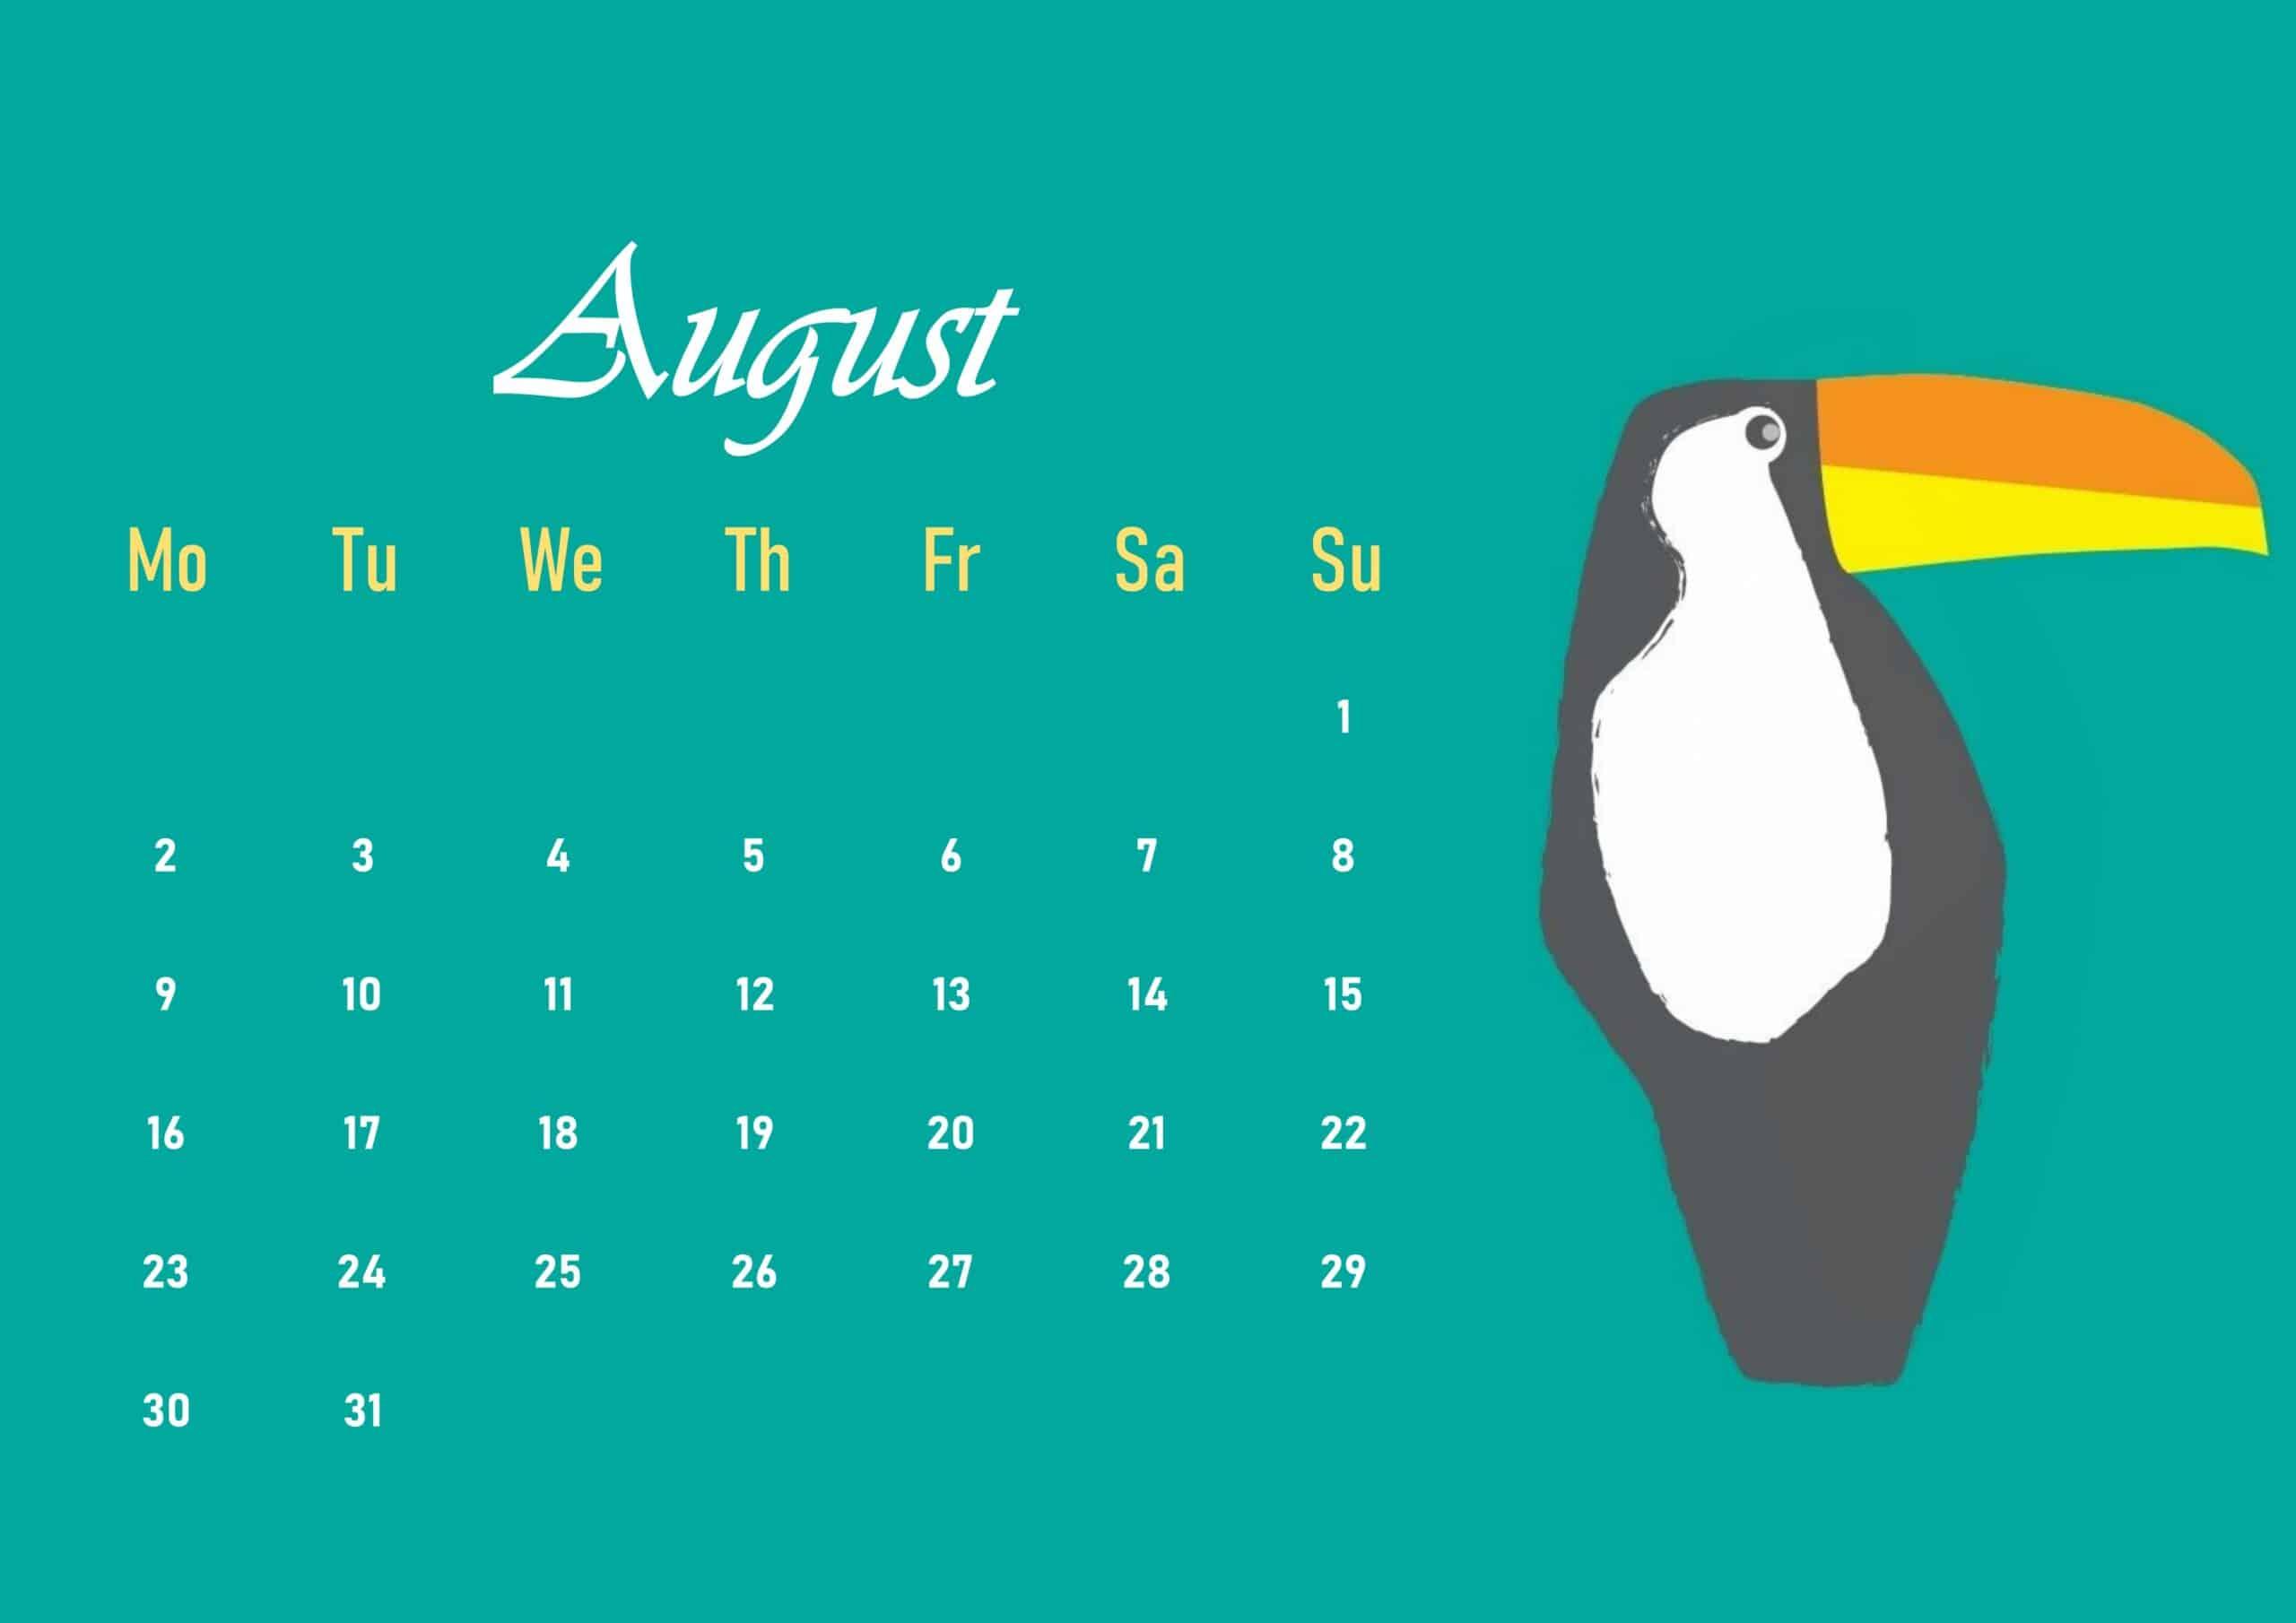 Cute 2021 August Calendar